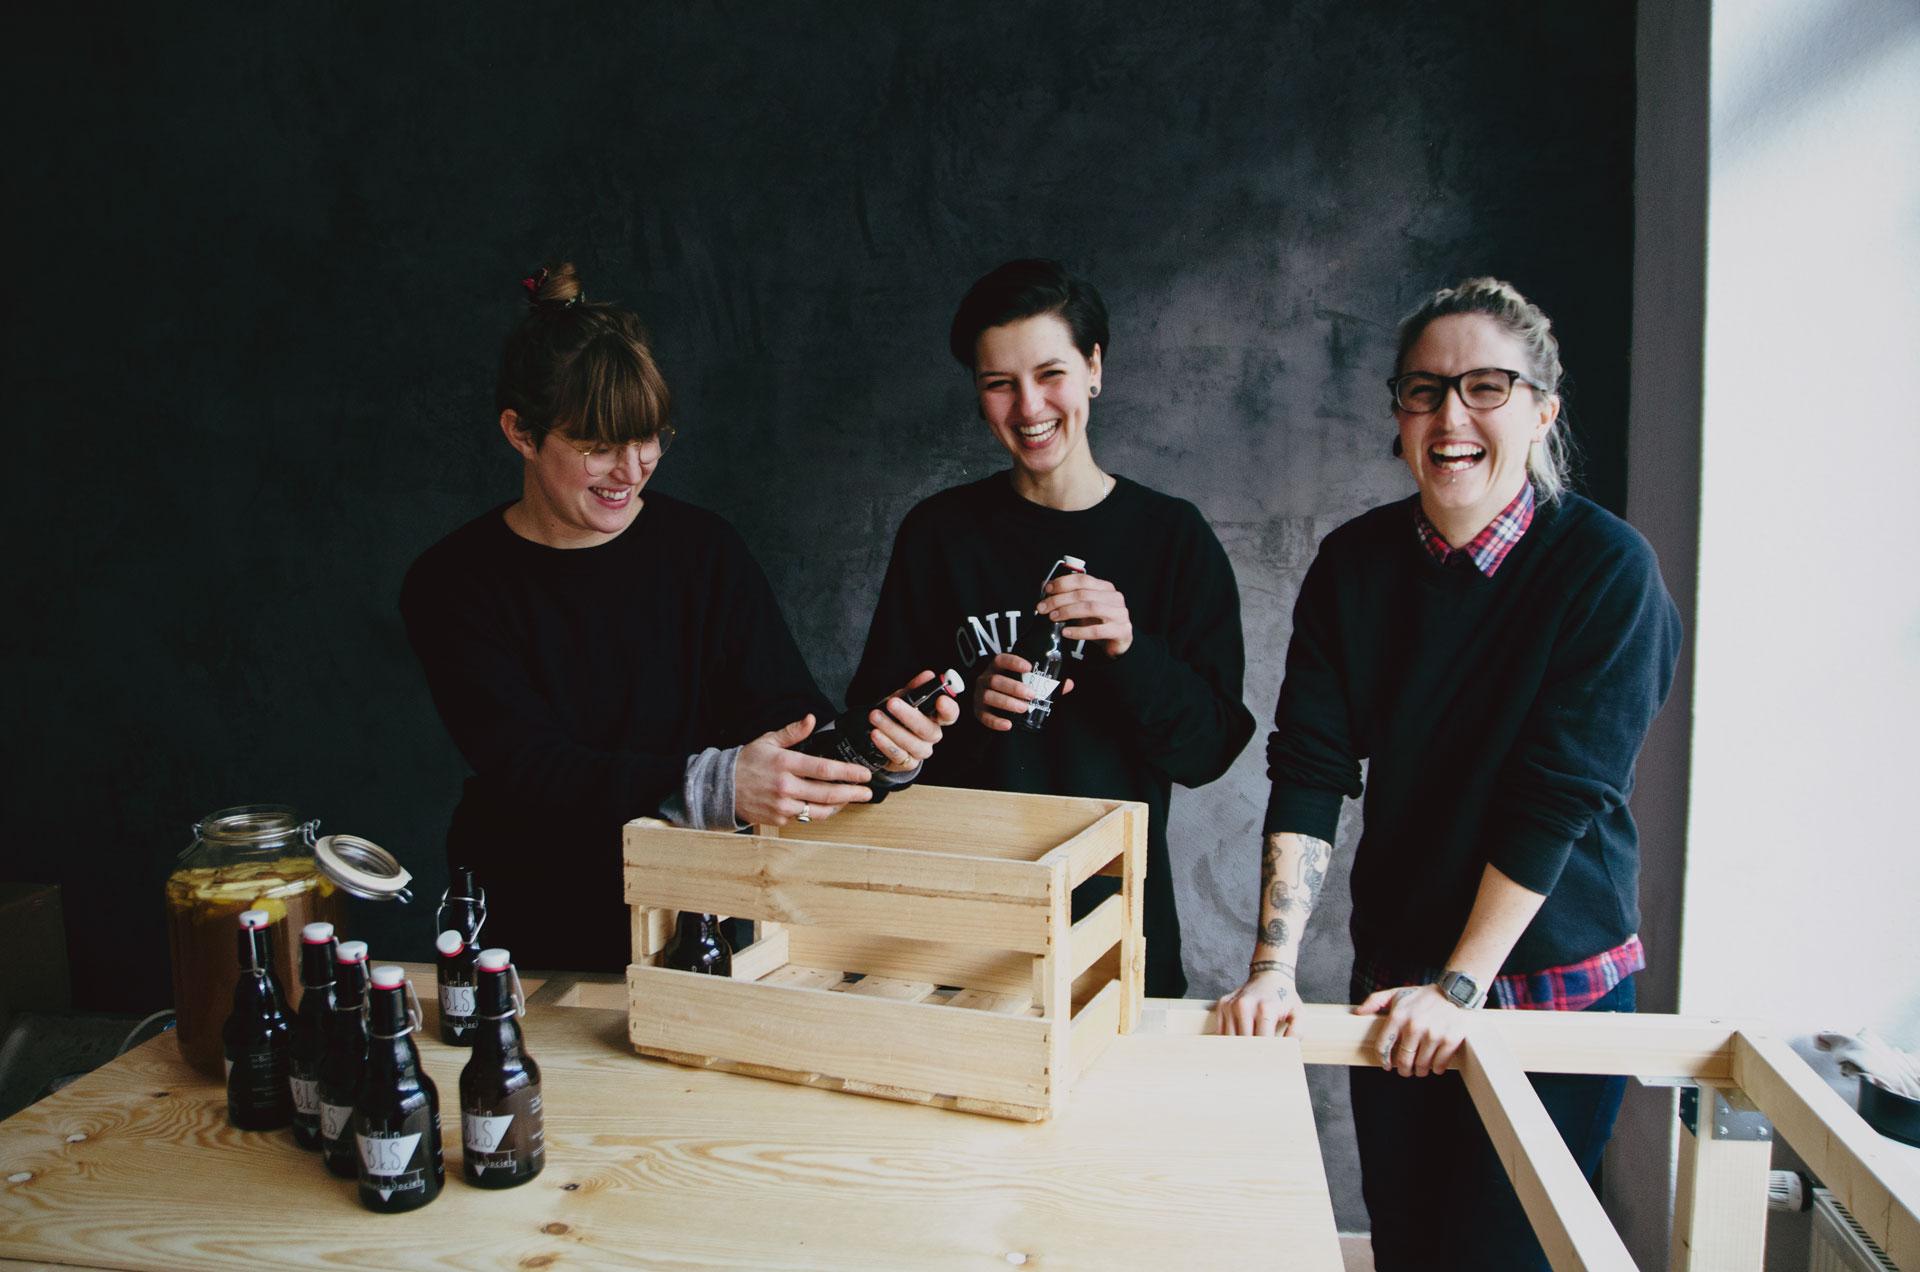 The Berlin Kombucha Society bottling the finished fermented kombucha